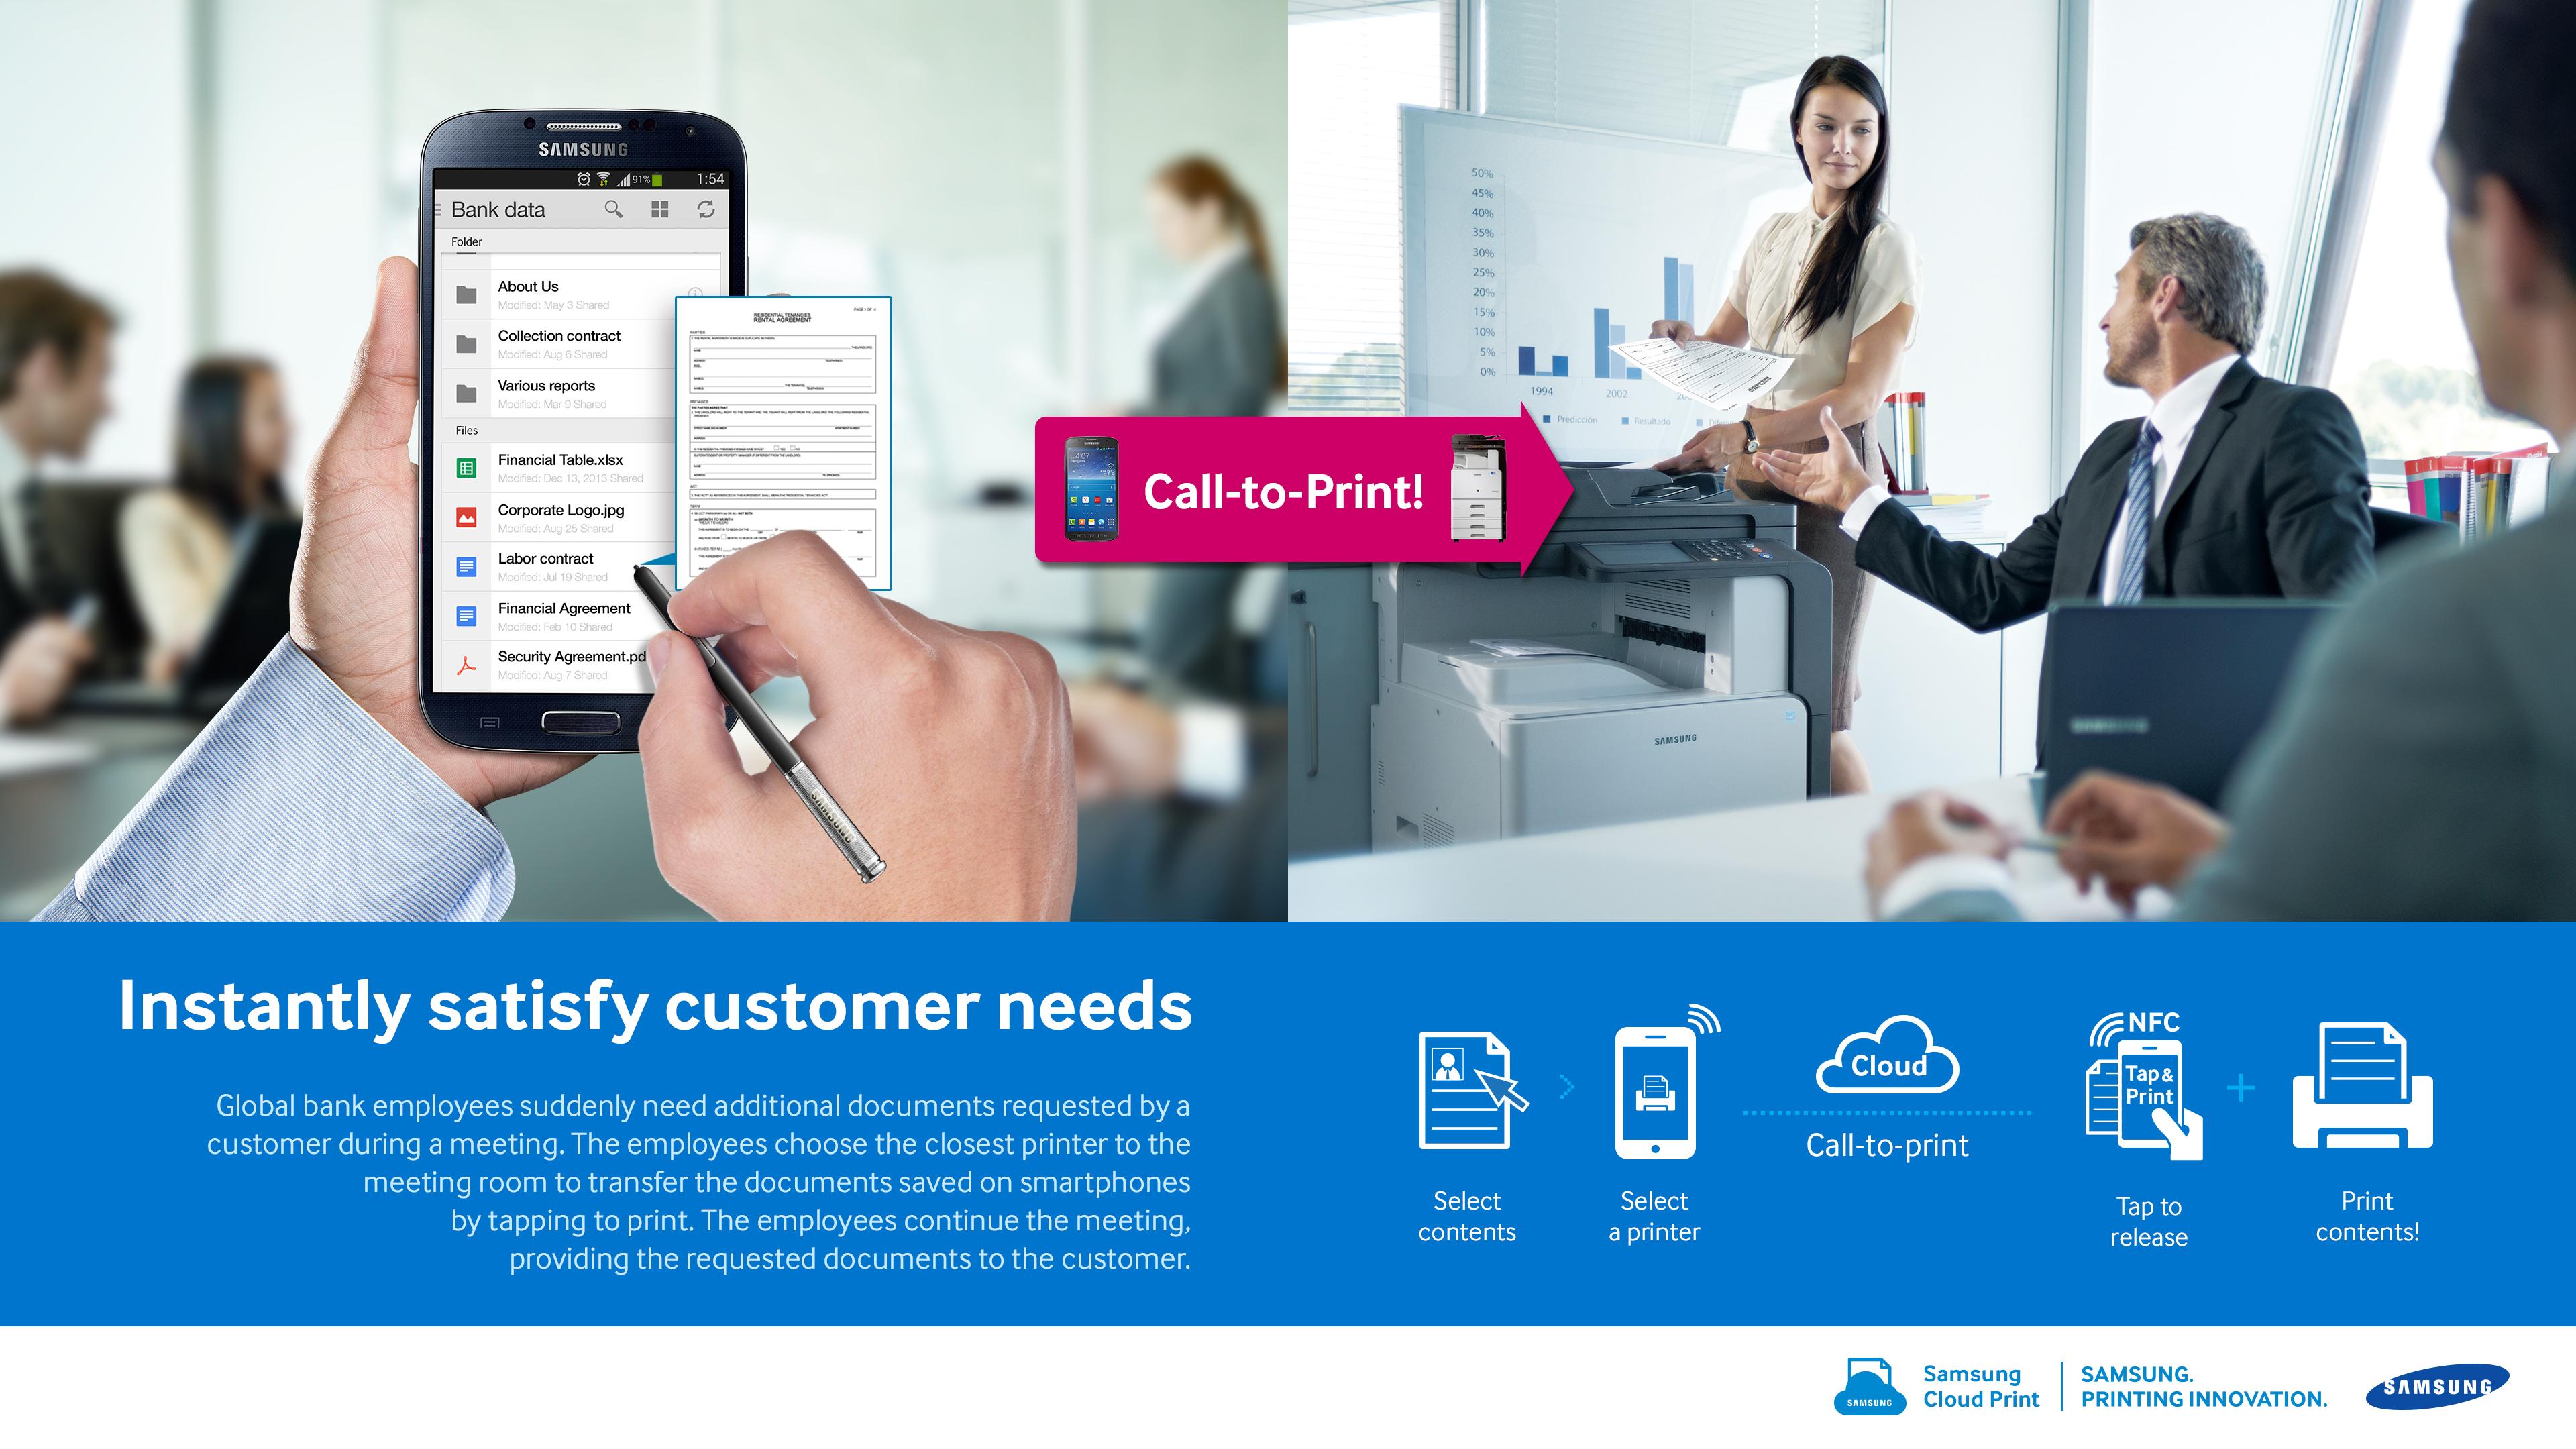 Samsung Cloud Print